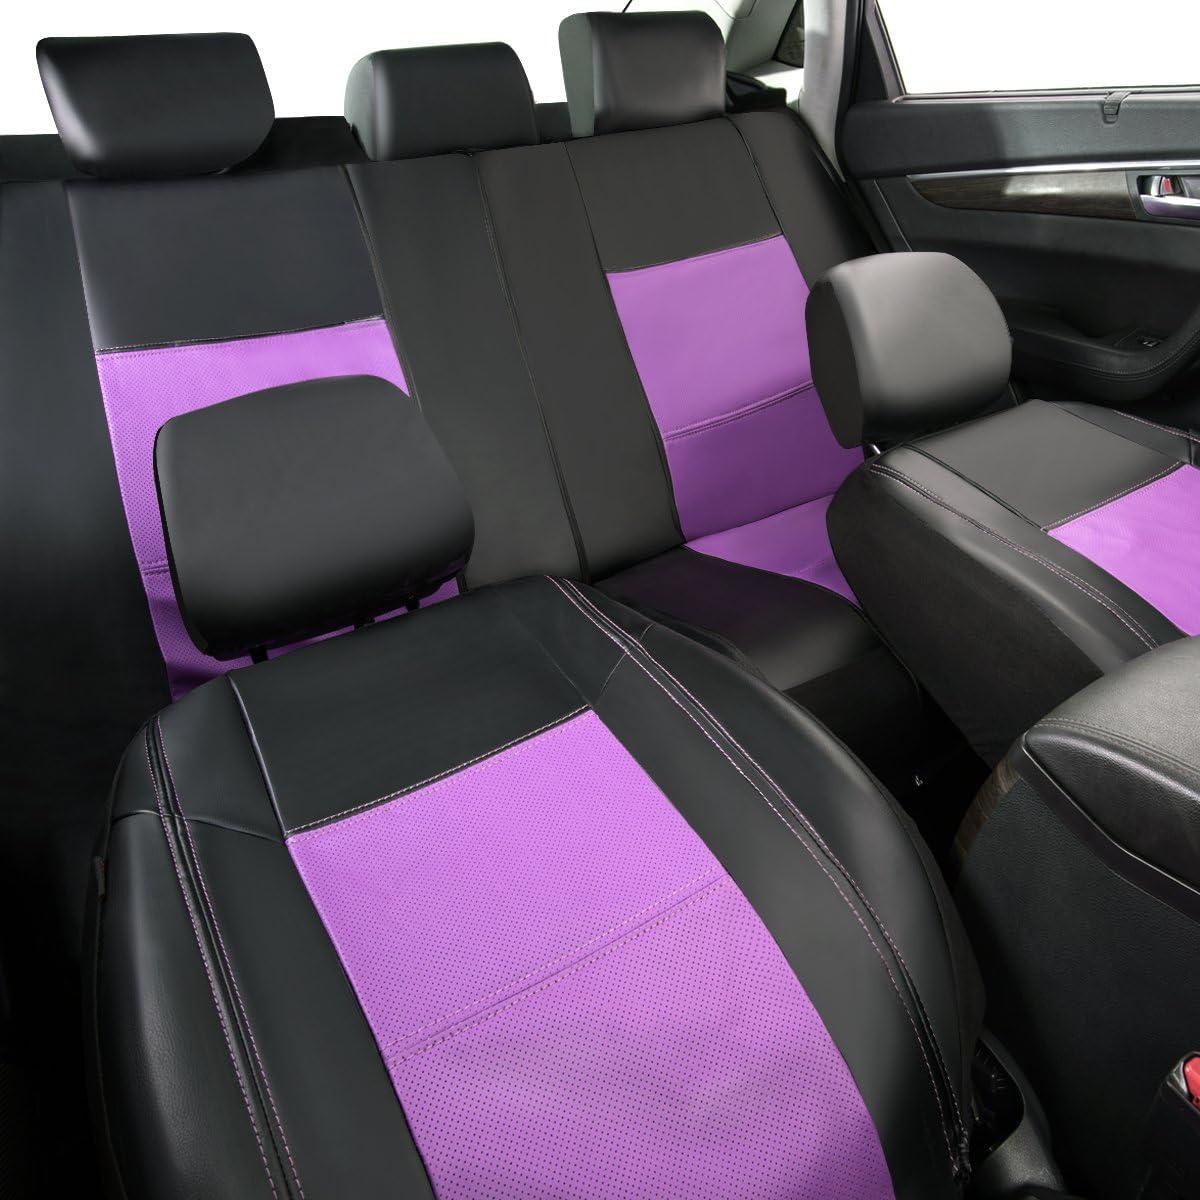 New arrival- Pass Skyline PU-Leder Autositzbez/üge Fahrzeuge Universal Passform f/ür Autos SUV